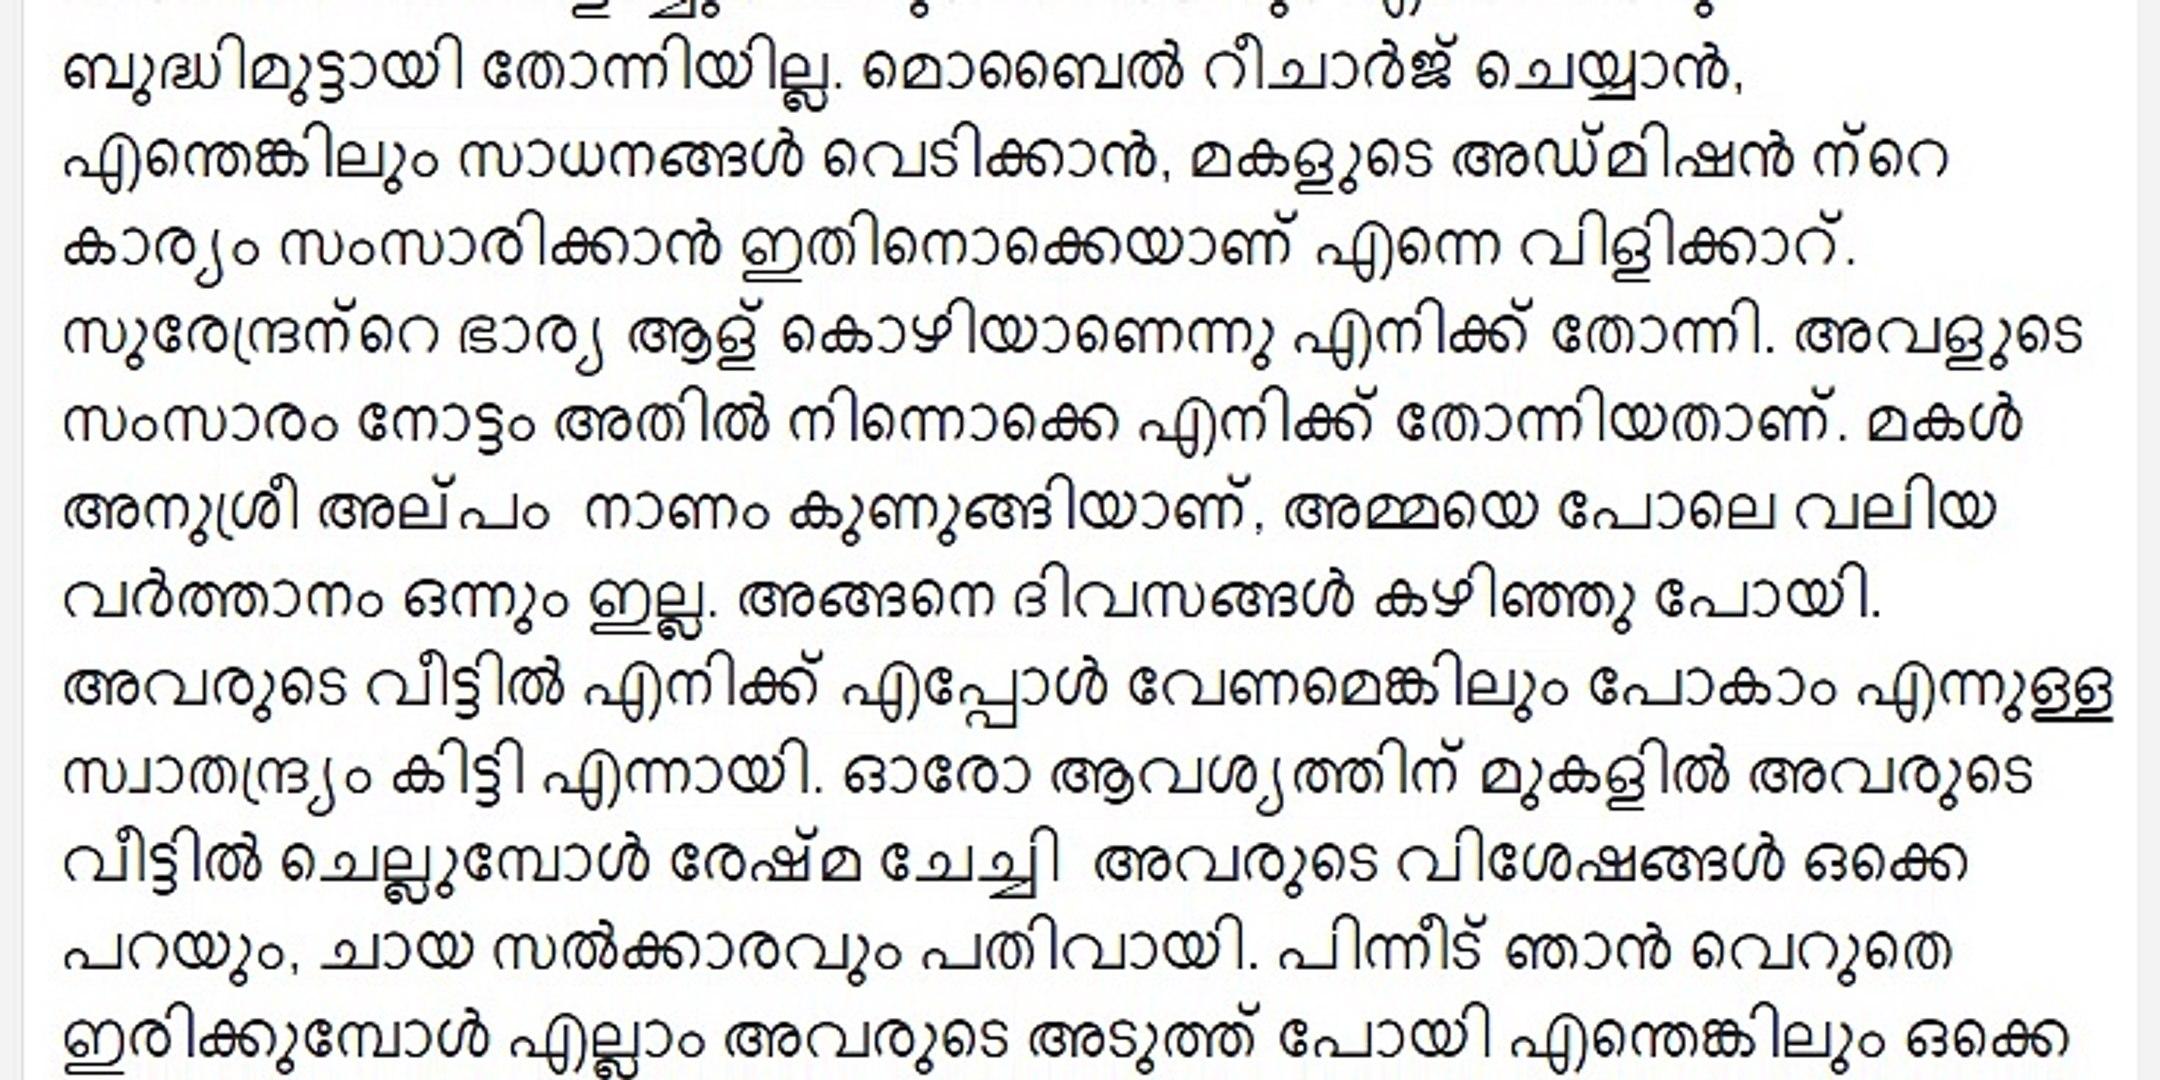 Rent House Malayalam kambikatha വാടക വീട് കമ്പികഥ